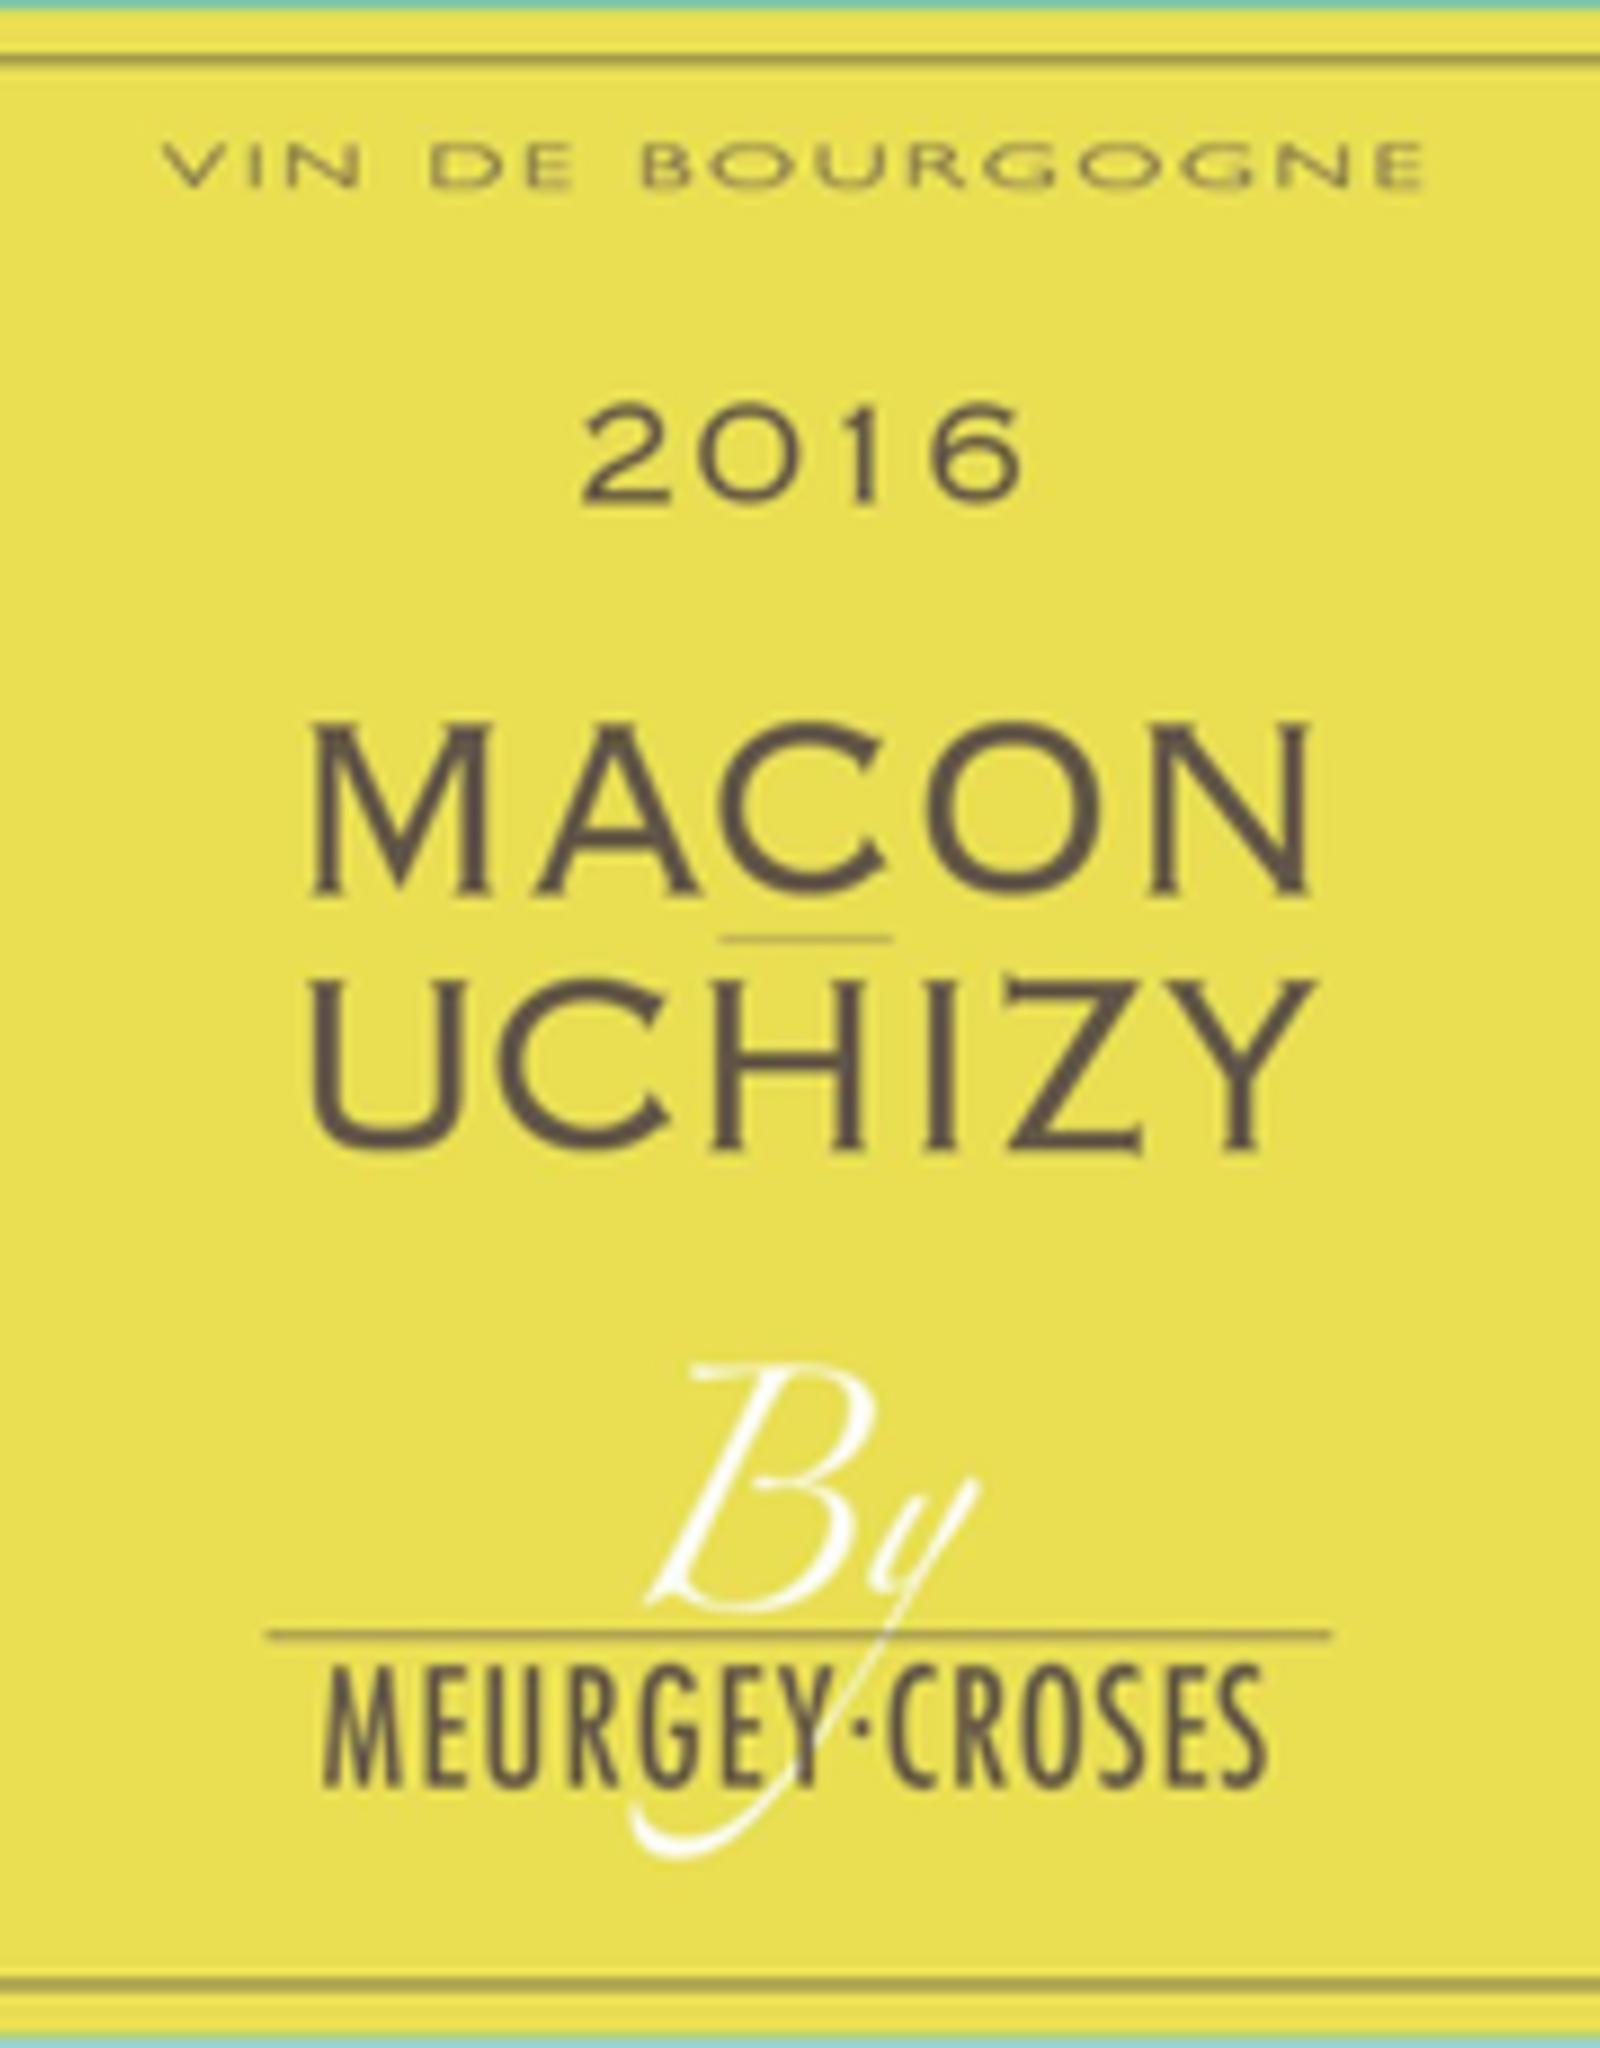 W Burgundy, Macon Uchizy, Meurgey-Croses 2018